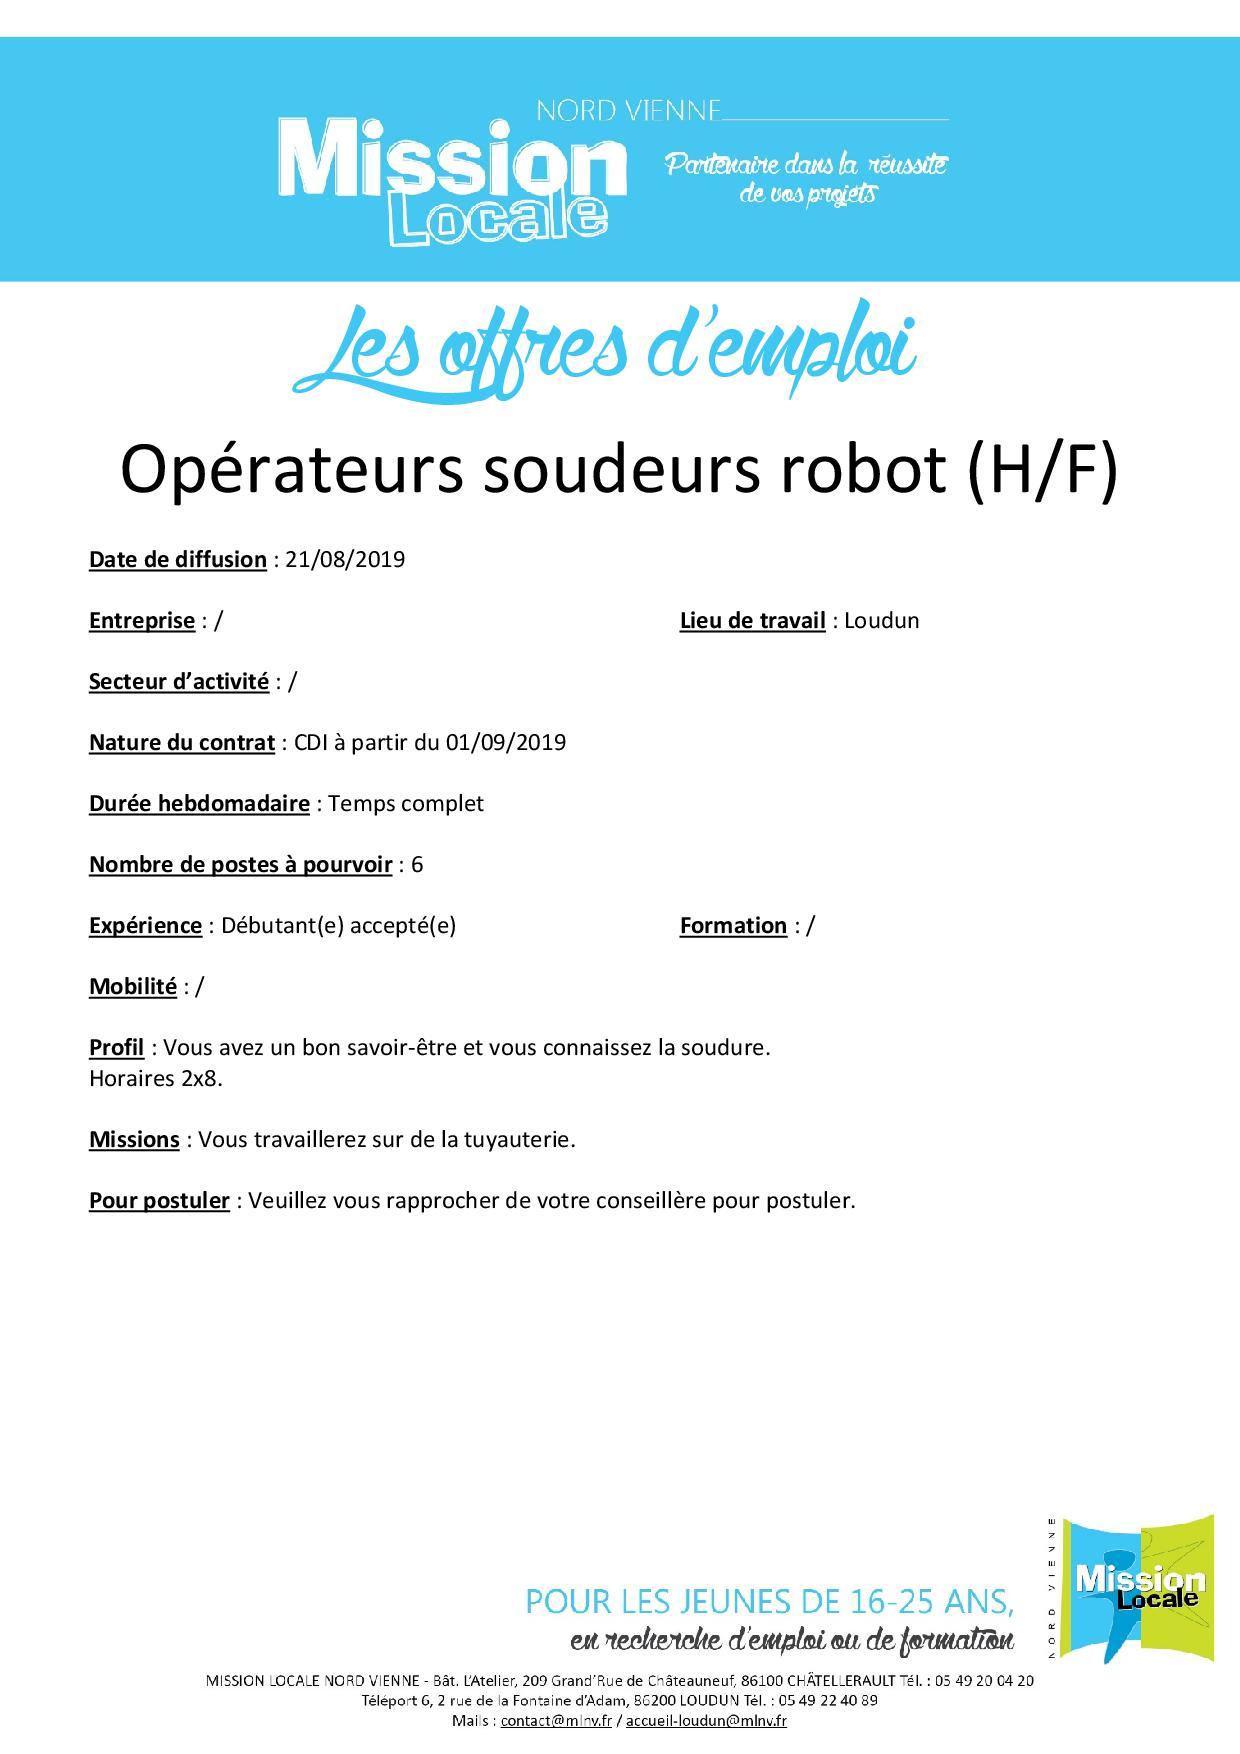 Opérateur soudeur robot (H/F)